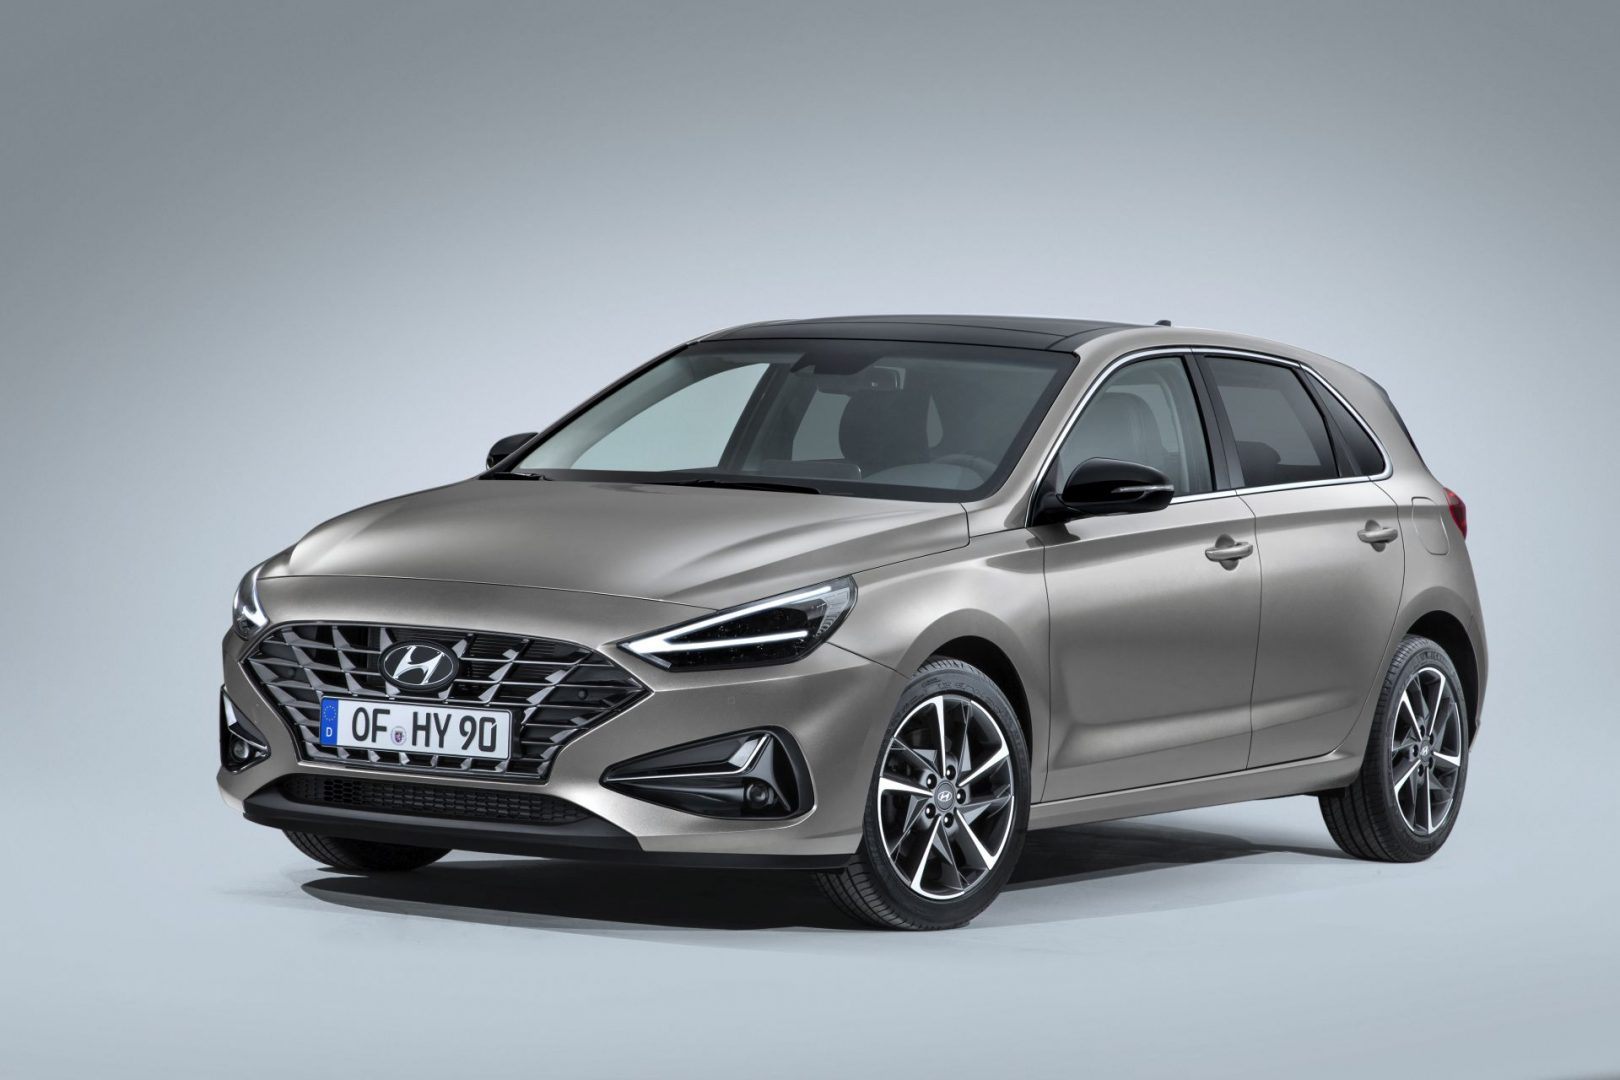 Redizajnirani Hyundai i30 donosi nove motore s 48V blagim hibridnim sustavom